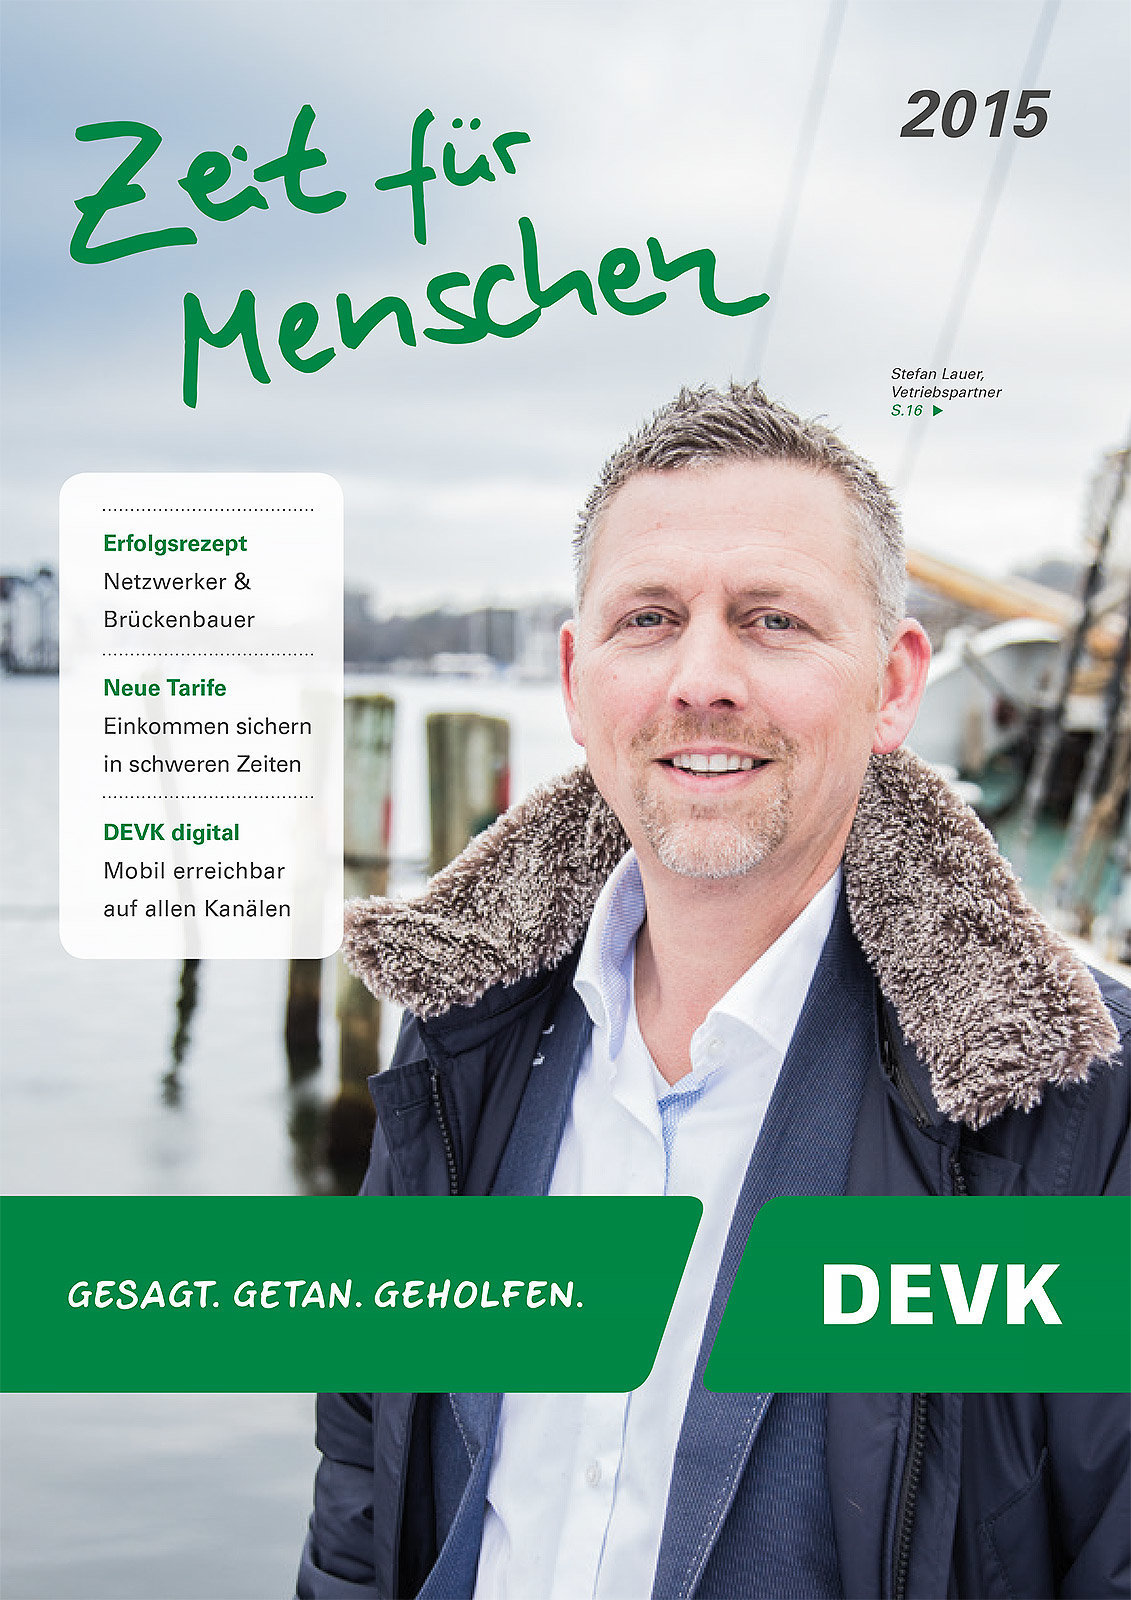 DEVK Imagebroschüre